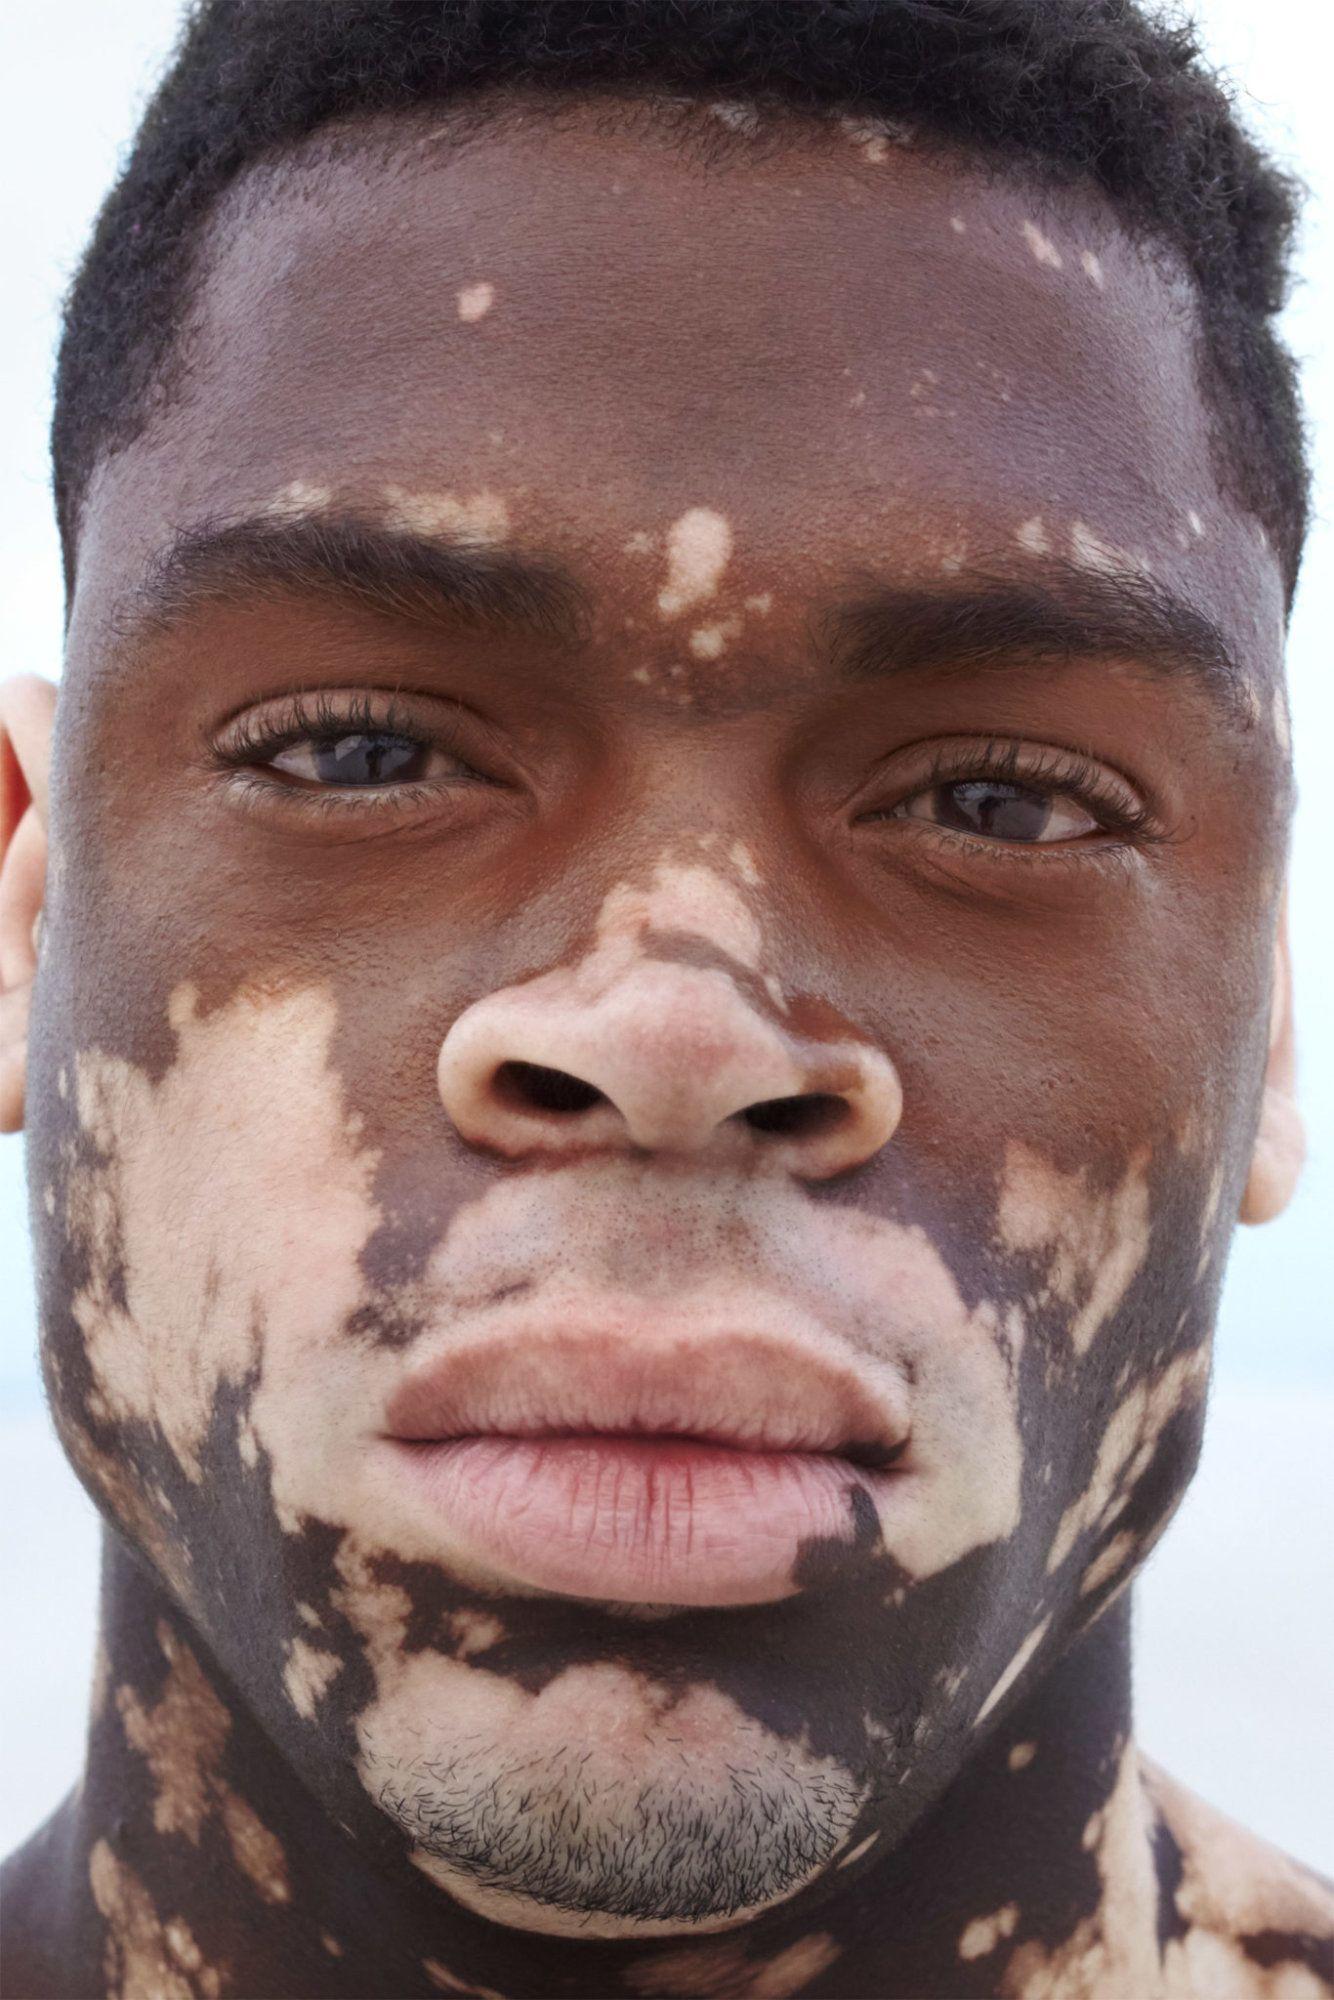 Pin By Rena Grace On Beautiful Men In 2020 Vitiligo Cure Vitiligo Treatment Vitiligo